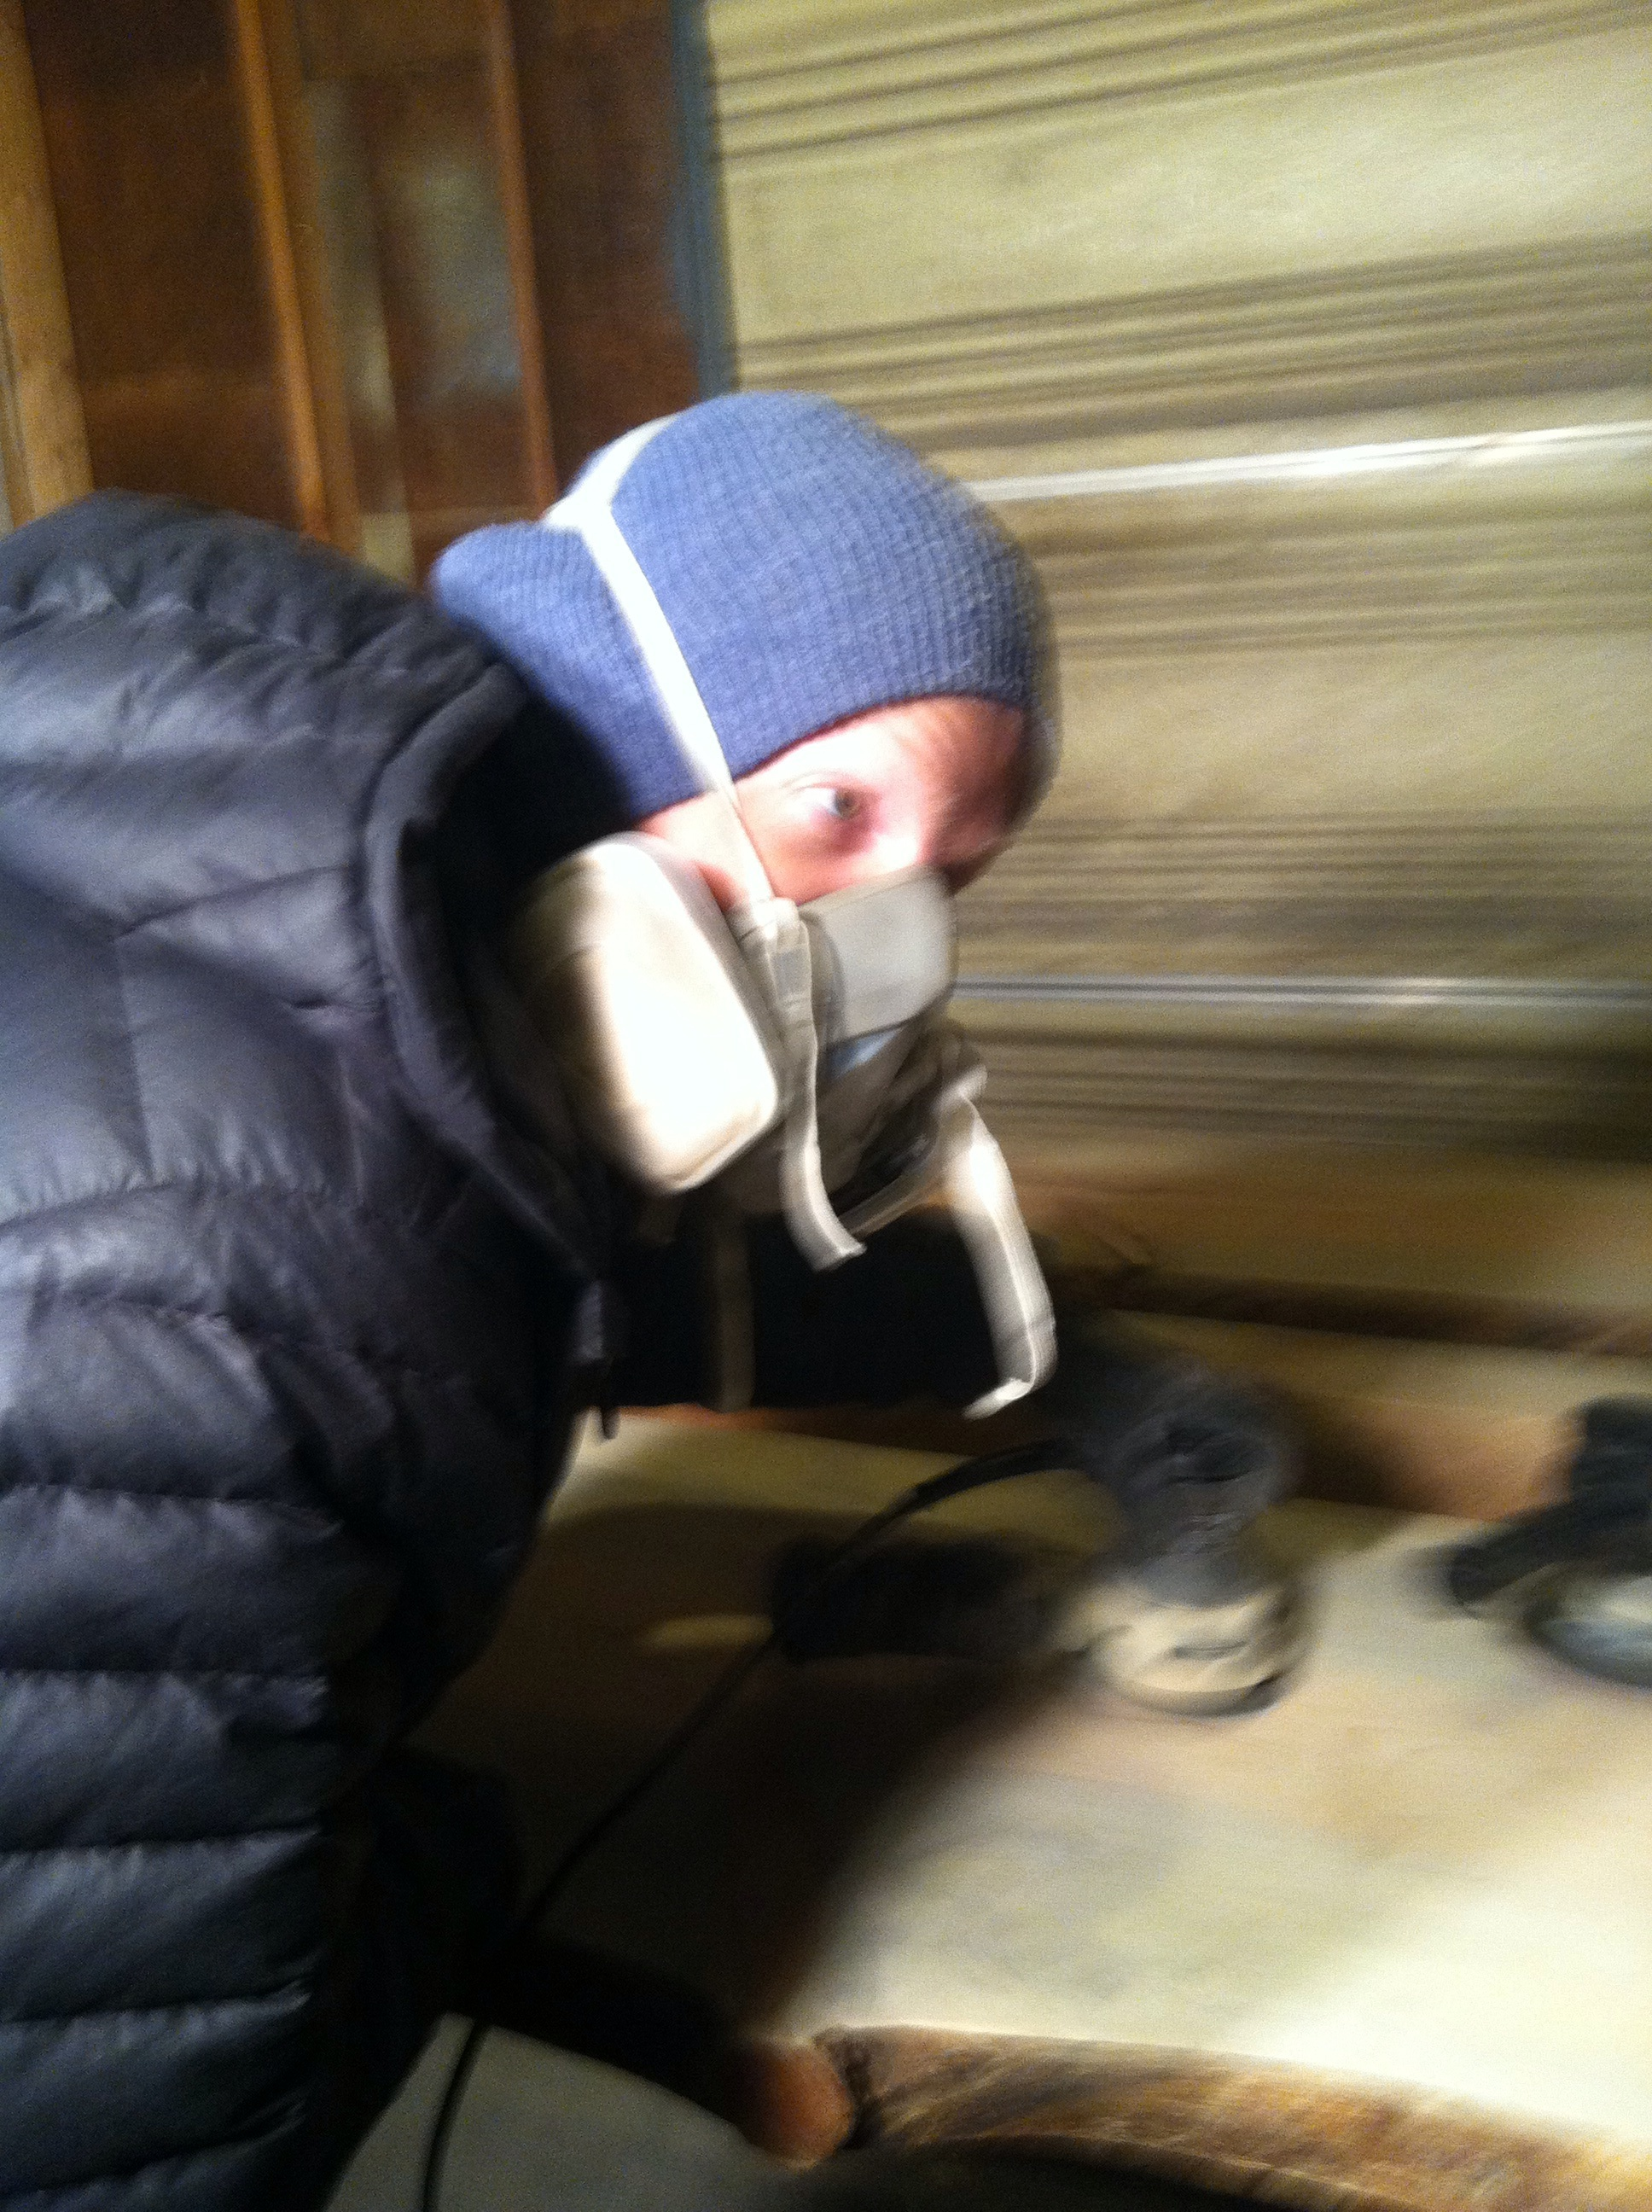 Joe Sheehan #bosshog sanding the bar down